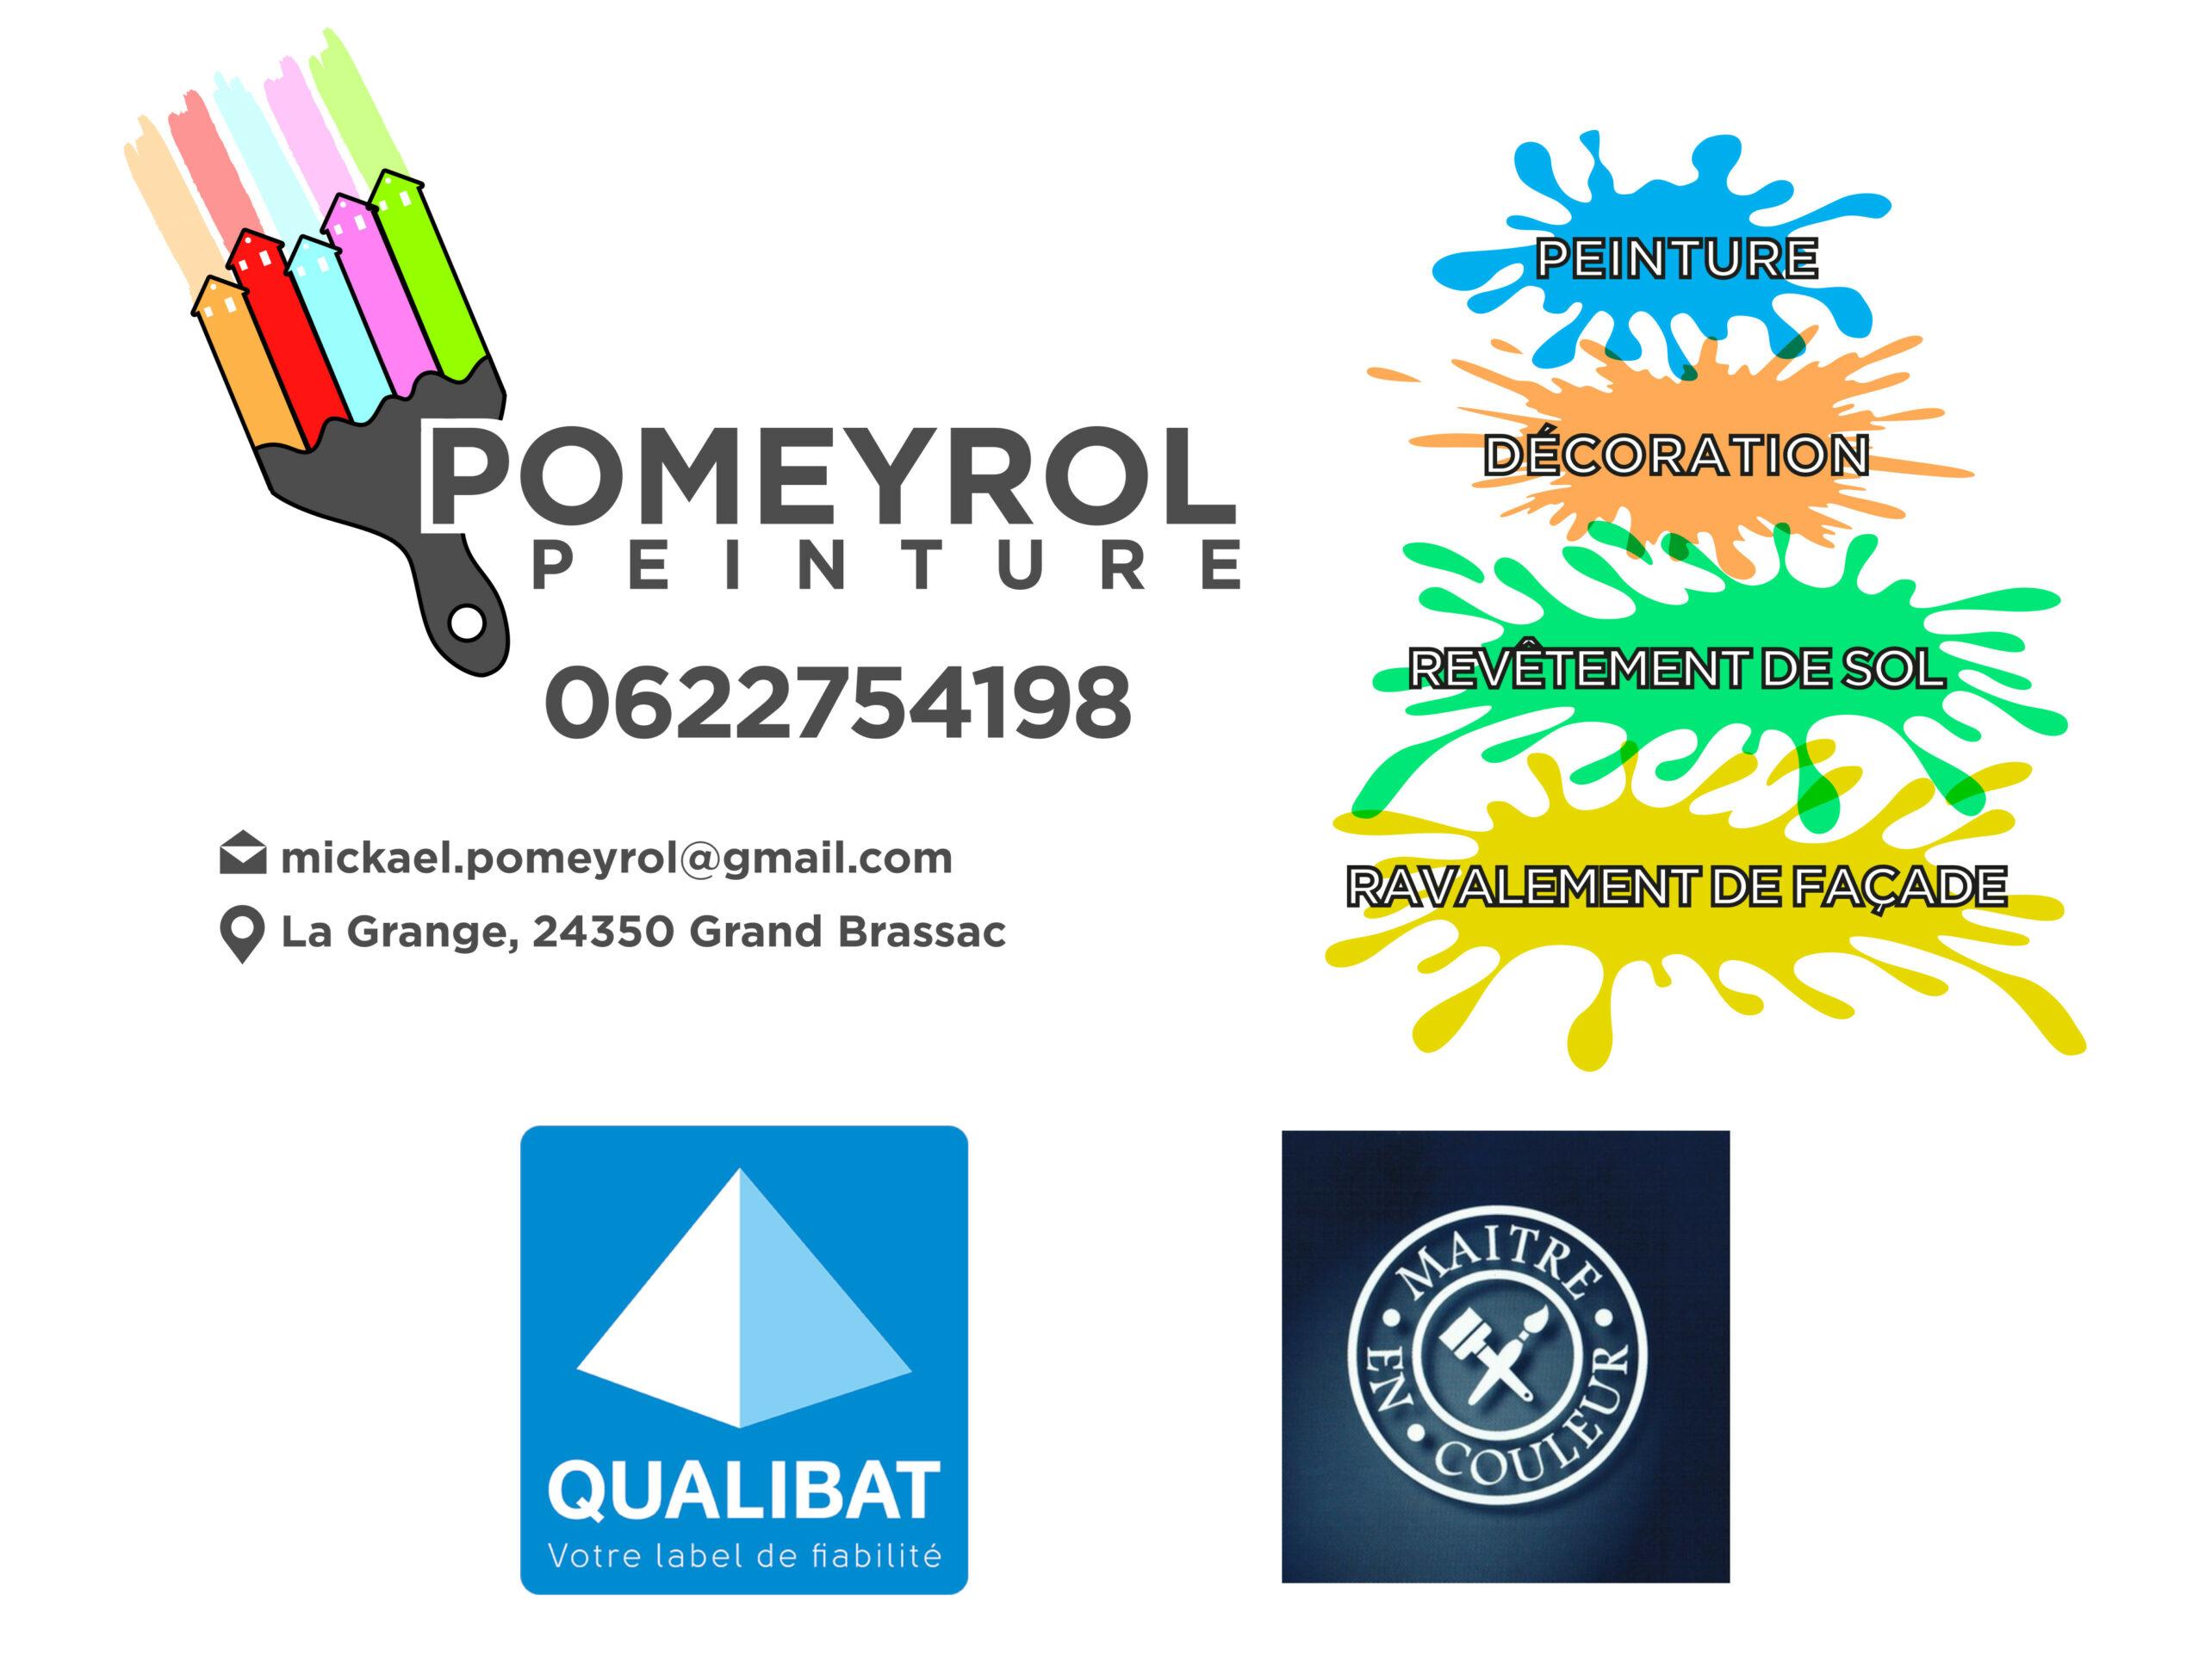 Pomeyrol peinture en bâtiment